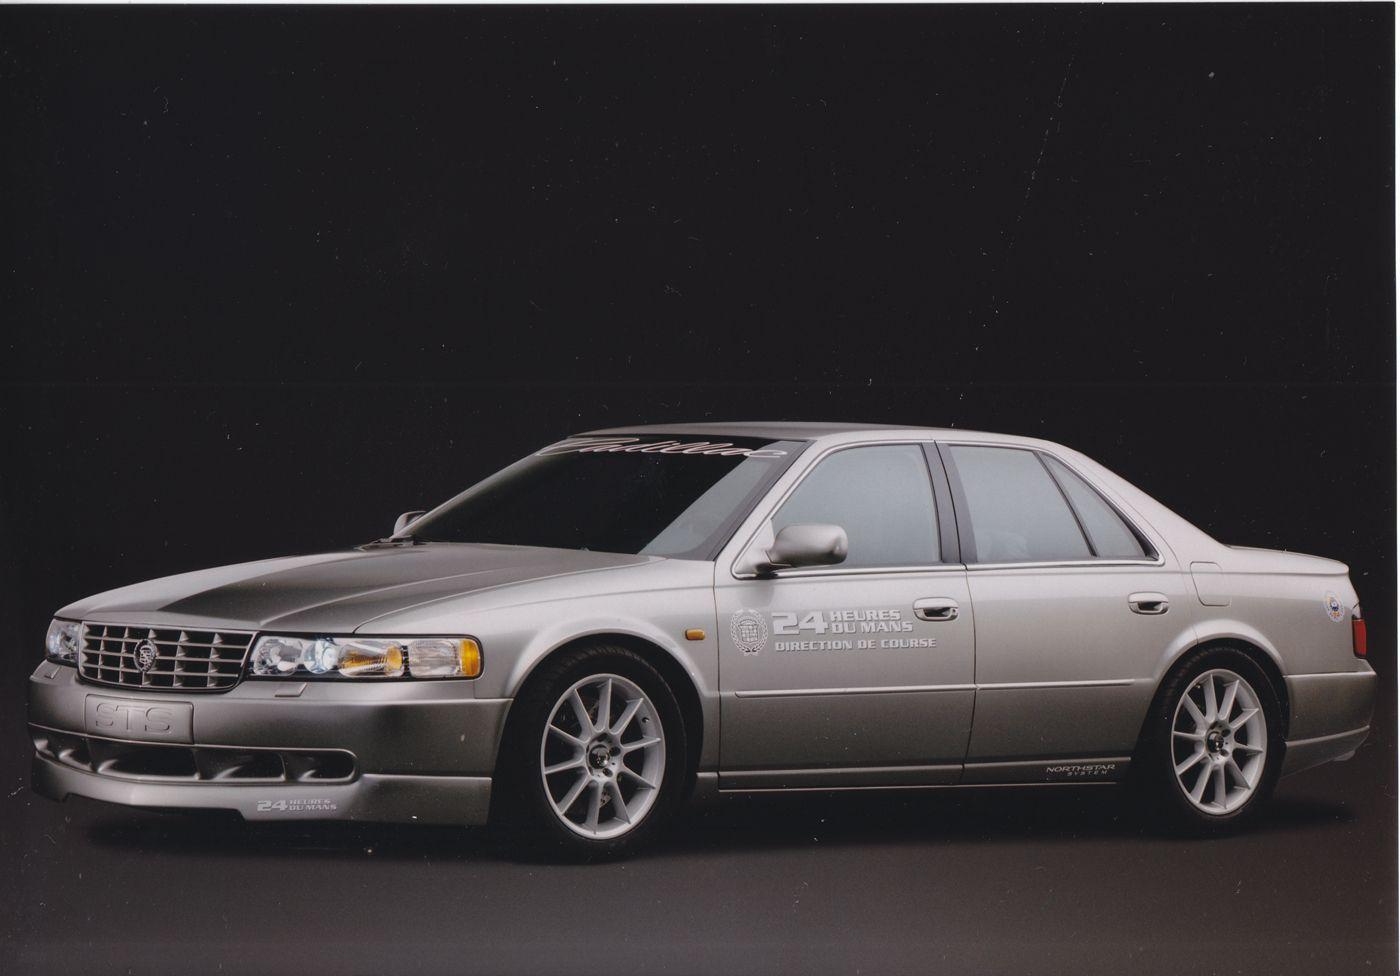 Cadillac Seville STS Le Mans Edition - 2000